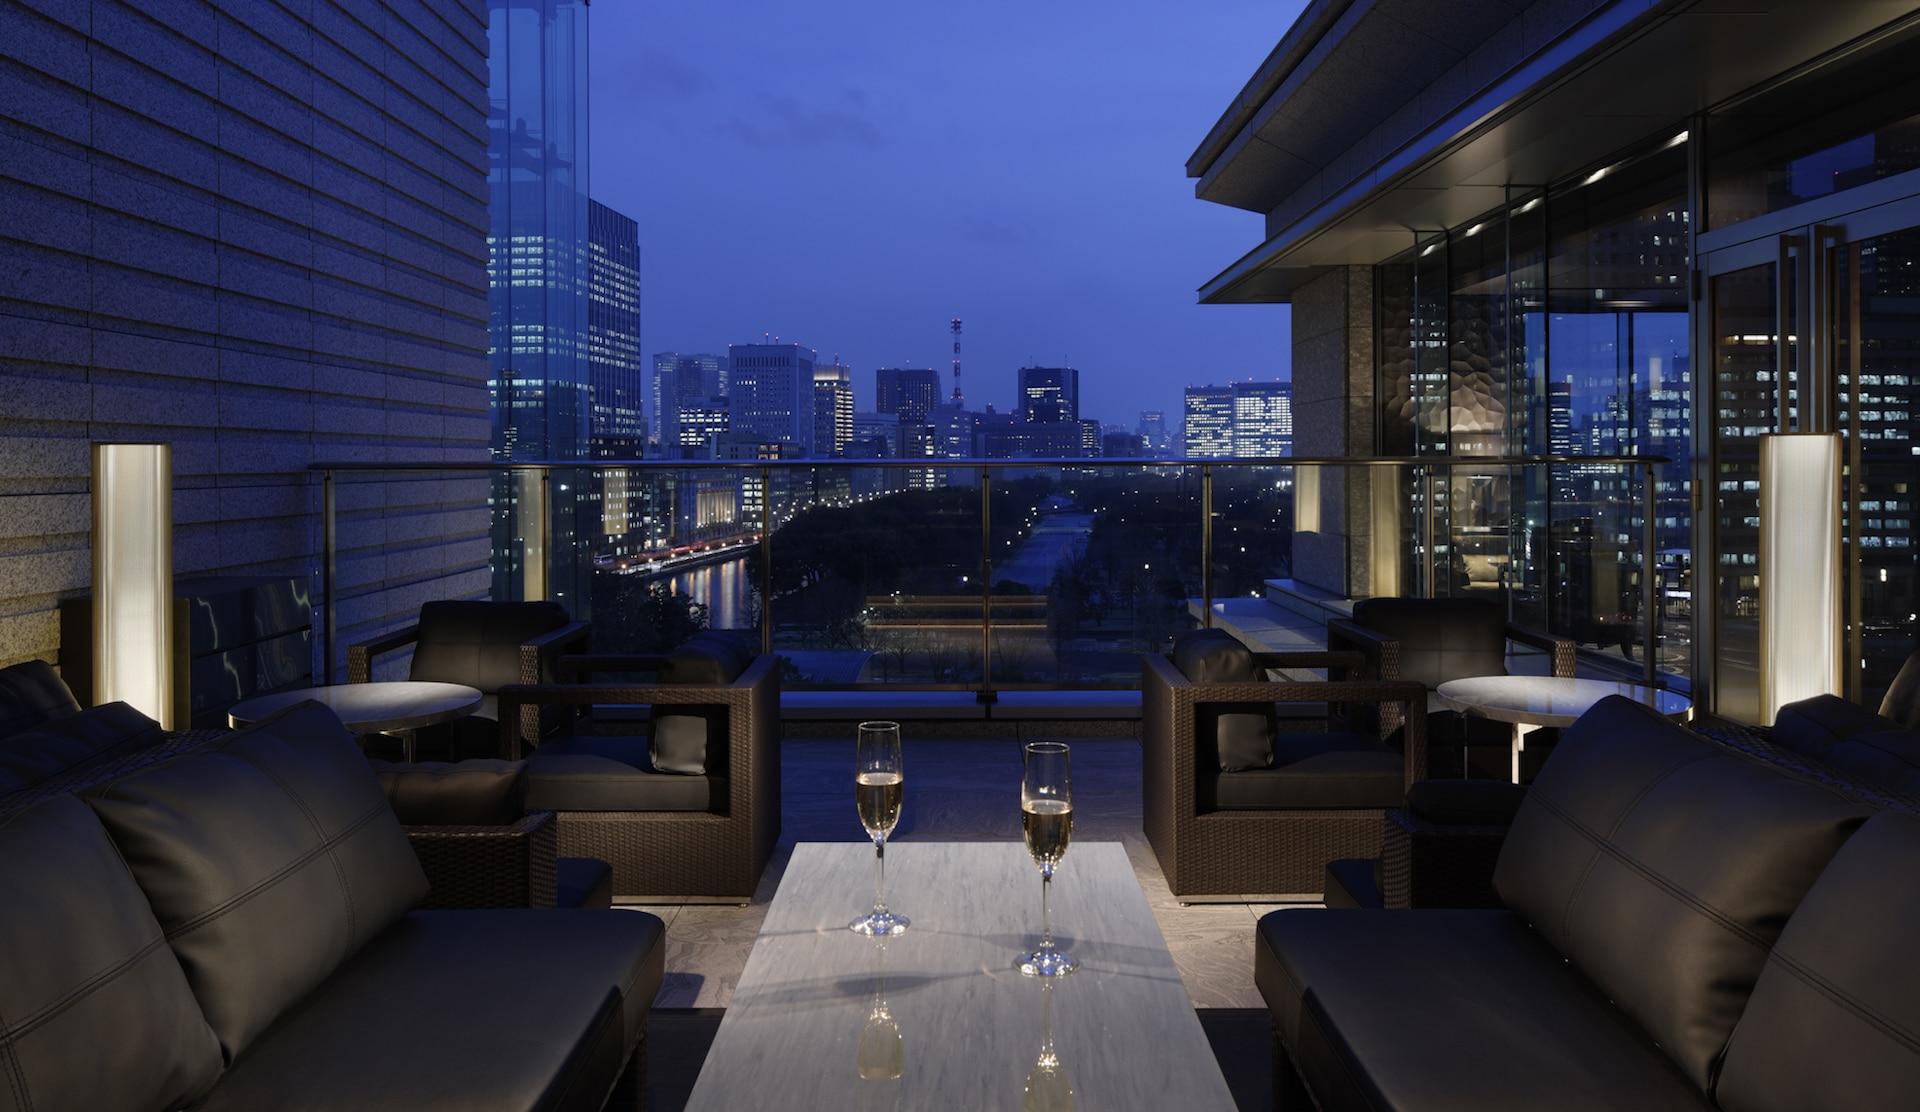 Palace Hotel Tokyo – Lounge Bar Prive Terrace – F2